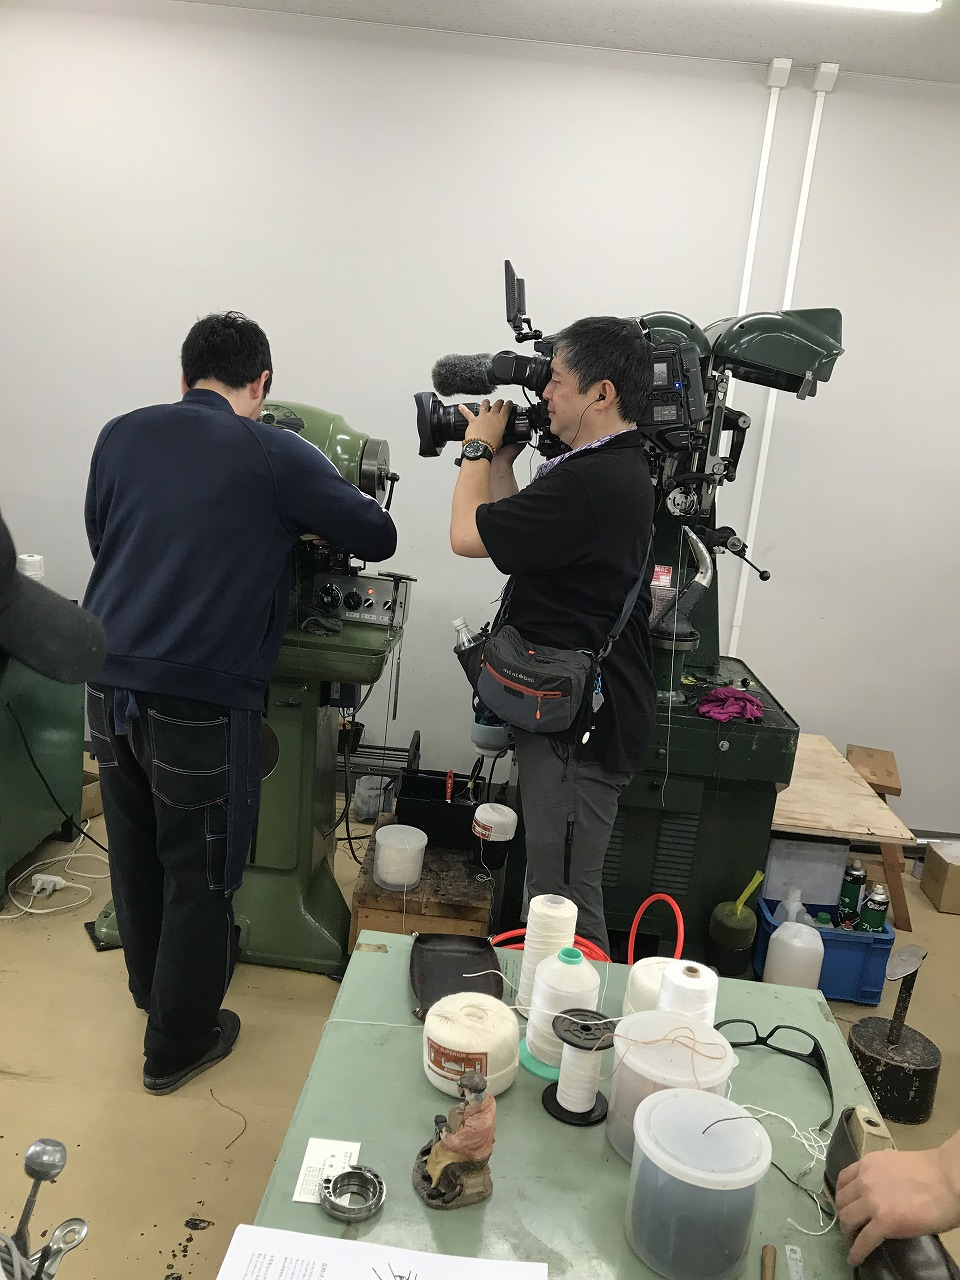 [NHK取材] 「ひるまえほっと」浅草の地場産業 革のものつくりと皮革産業資料館